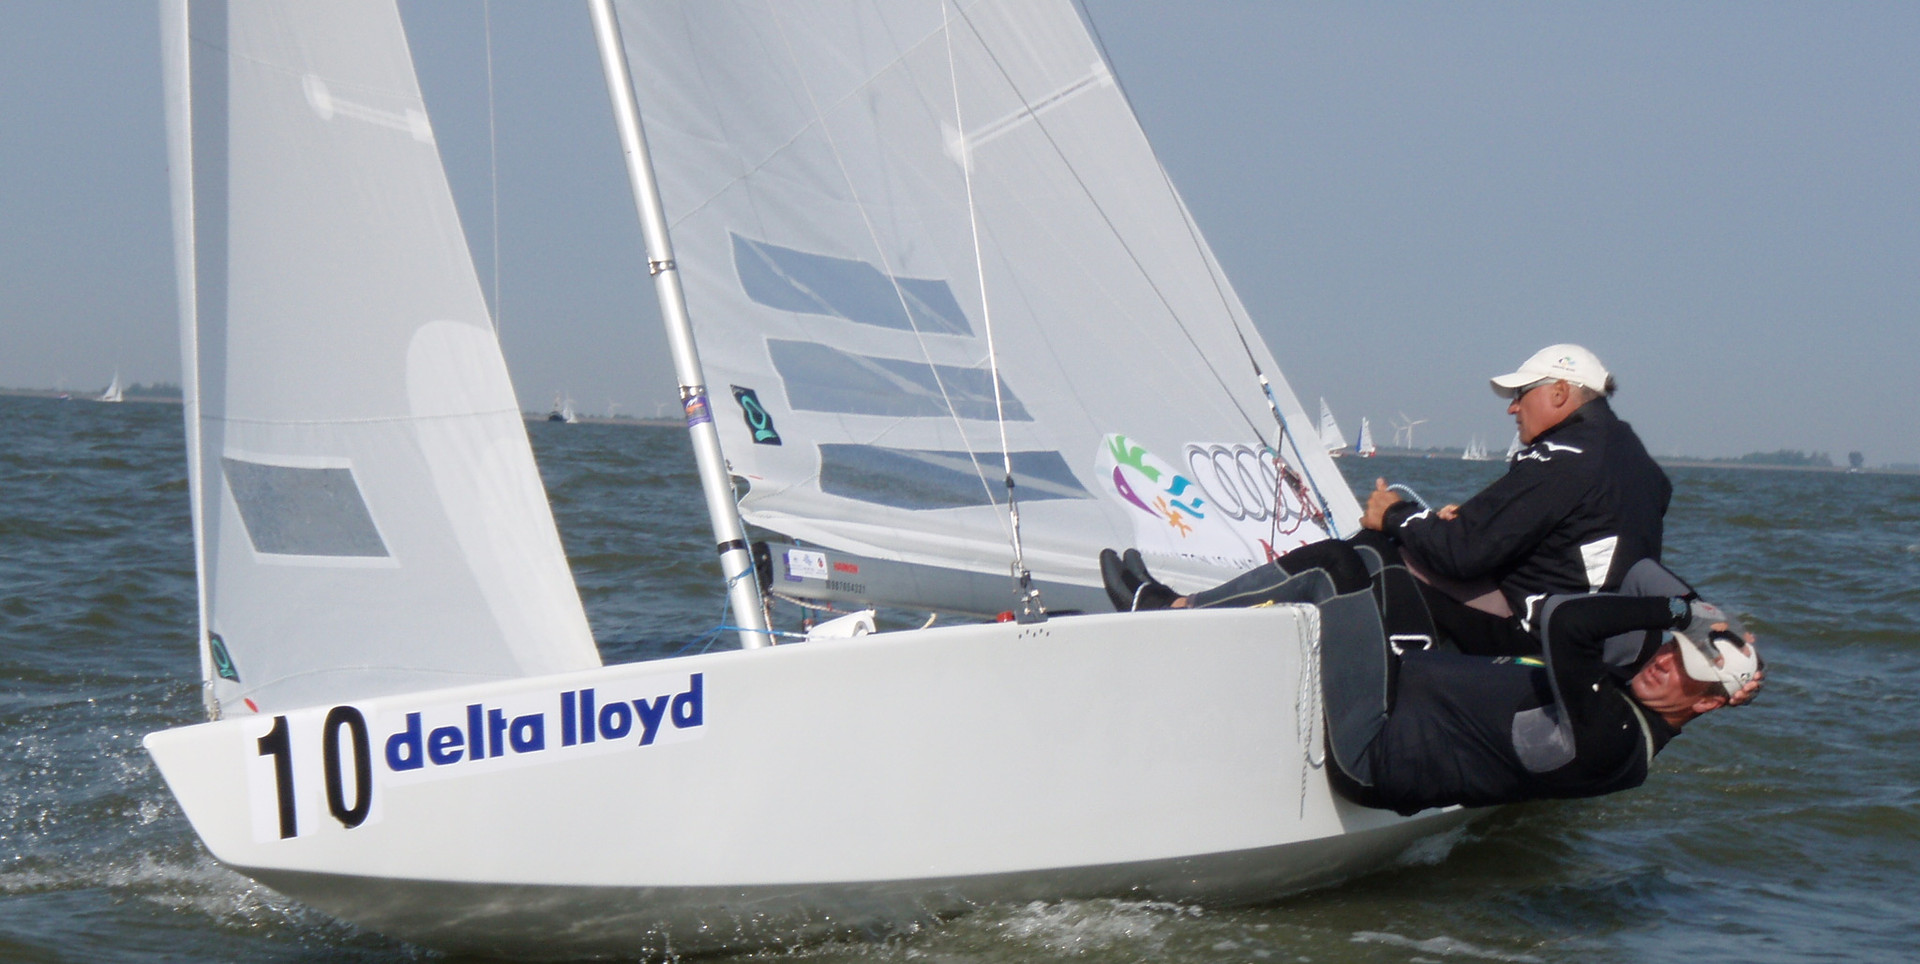 Andrew-Dog-Palfrey-sailing-Star-with-Iai